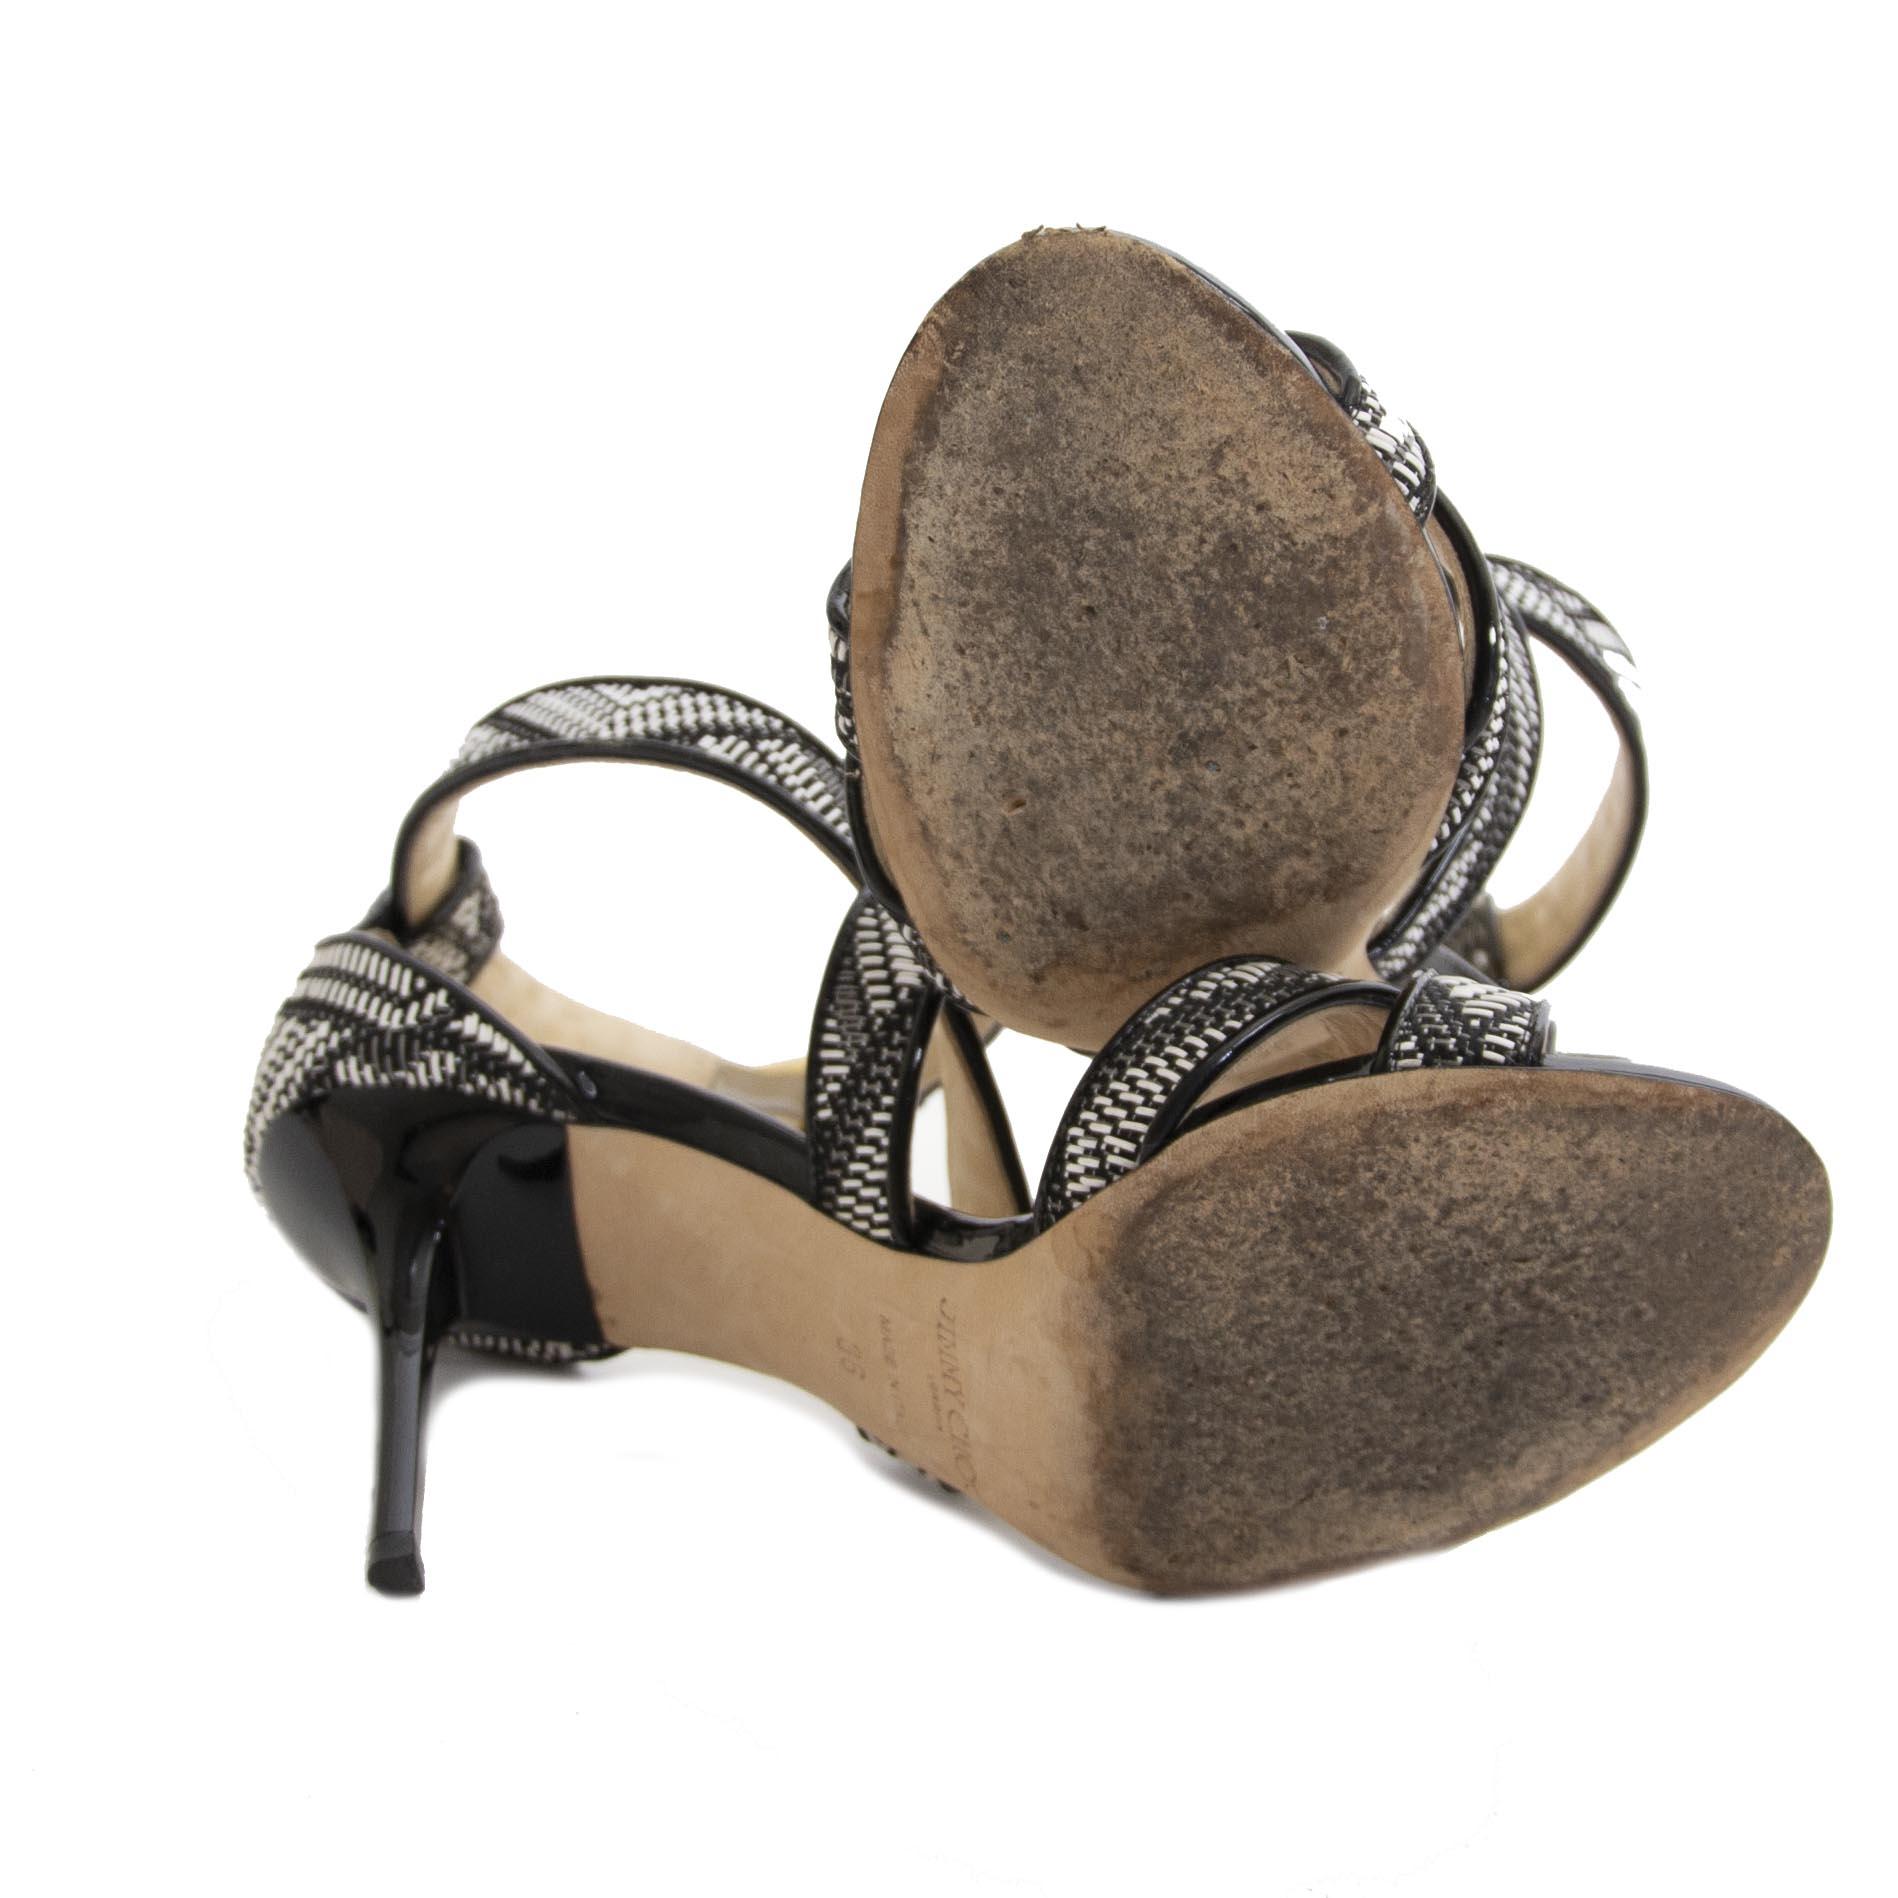 59ea1fb3a11 ... Jimmy Choo Braided Black   White Sandals te koop aan de beste prijs bij  Labellov